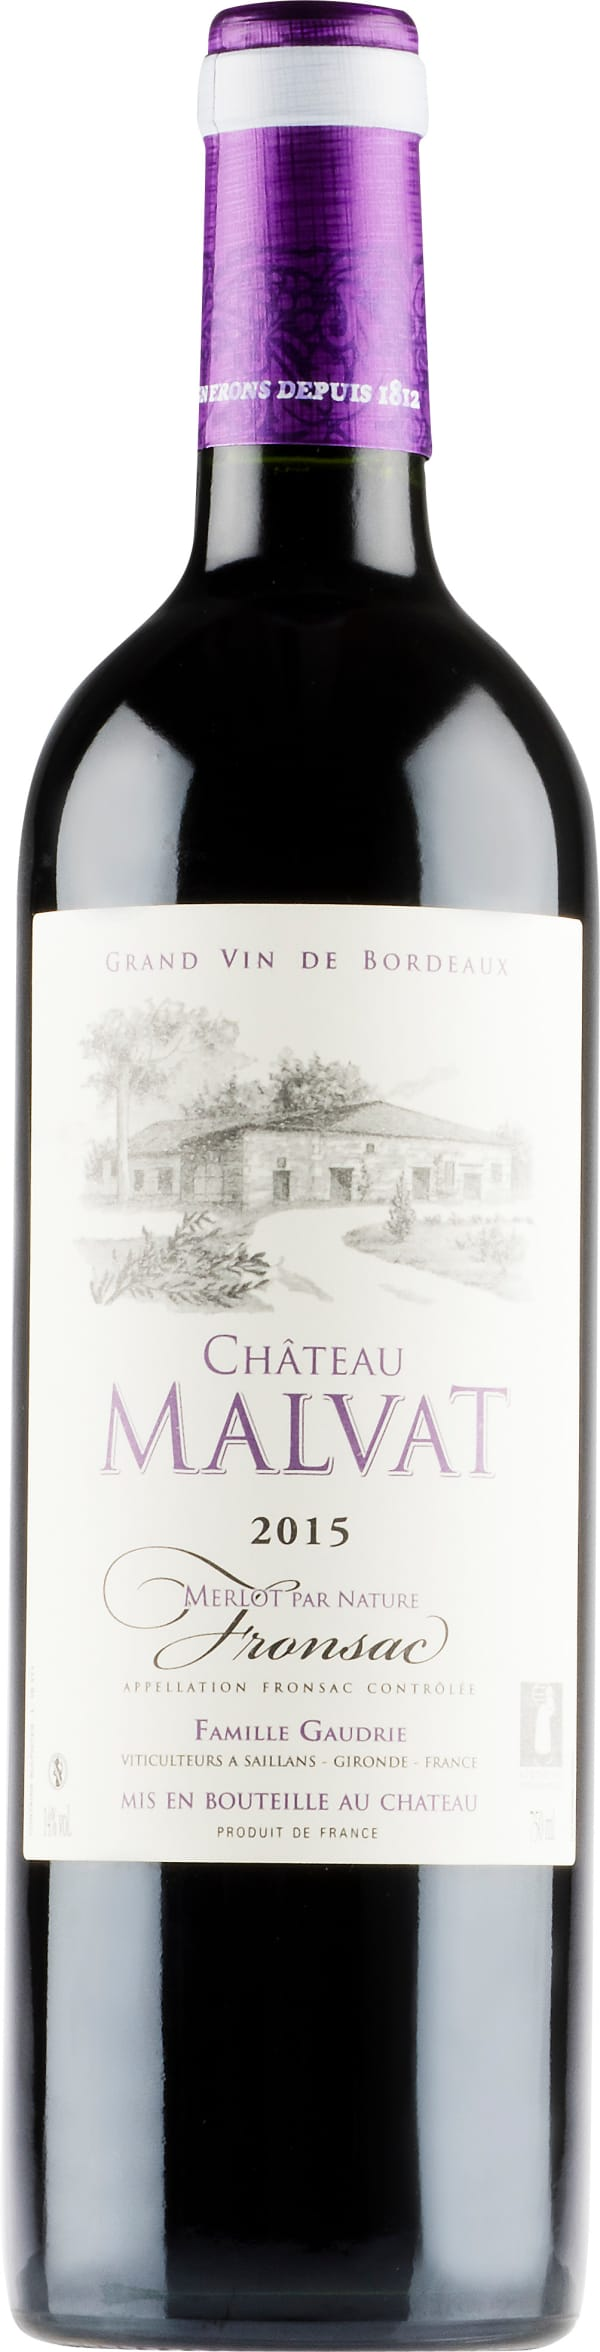 Château Malvat 2016